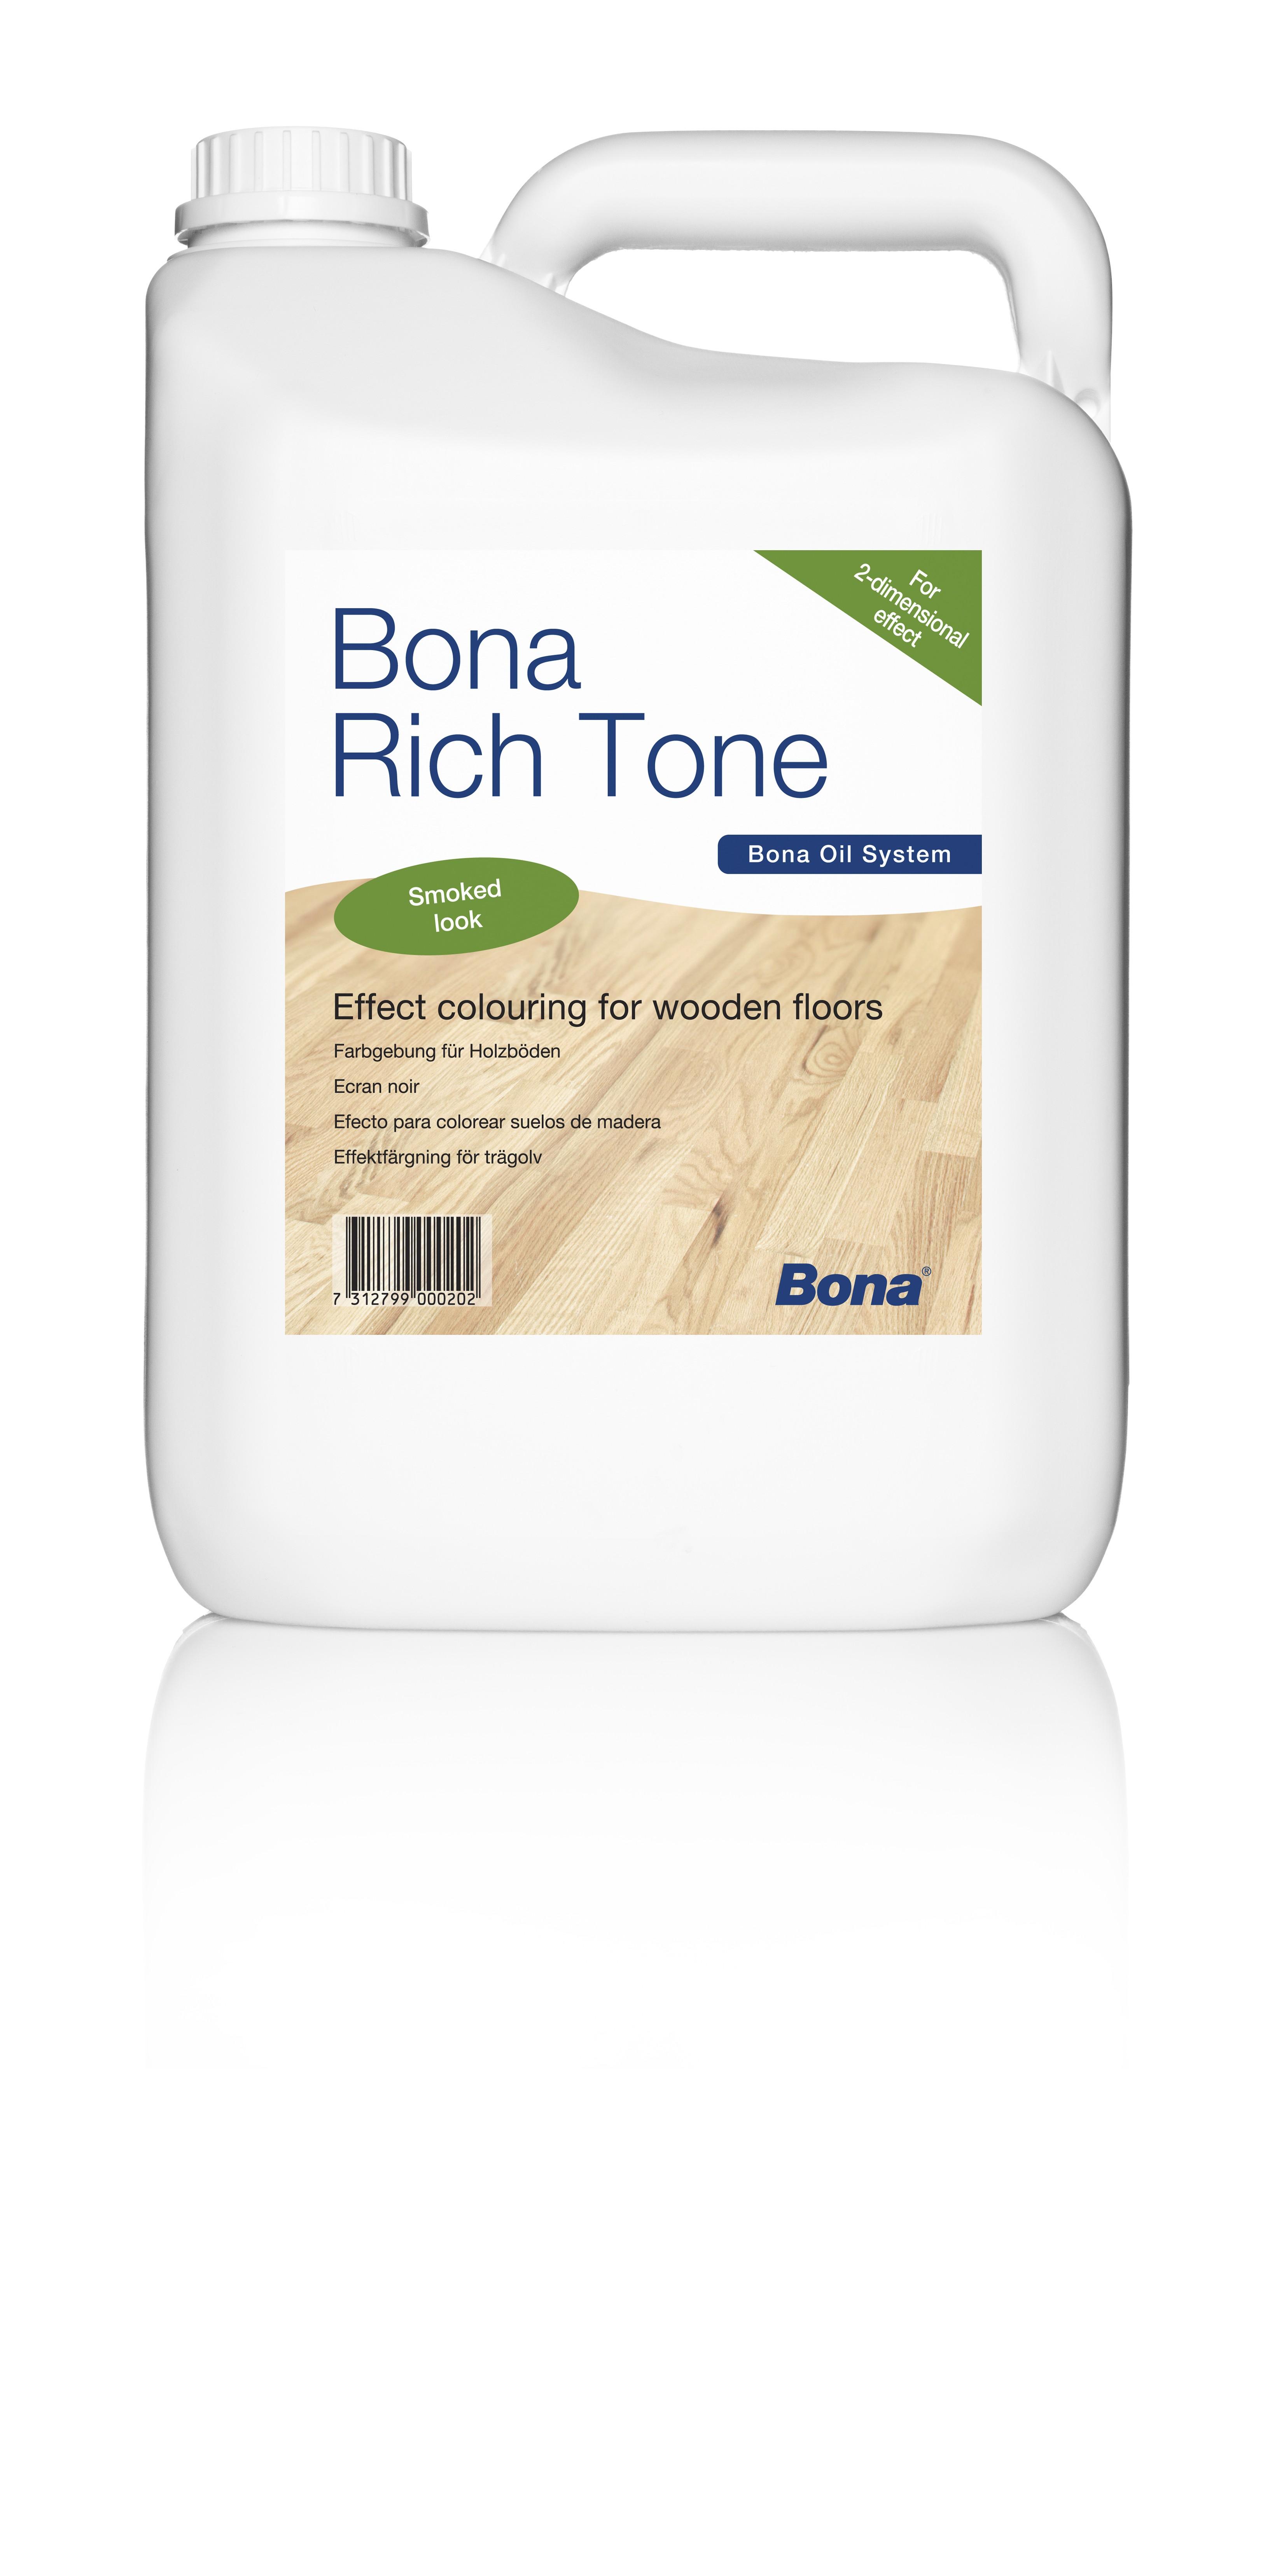 Bona Rich Tone 5L